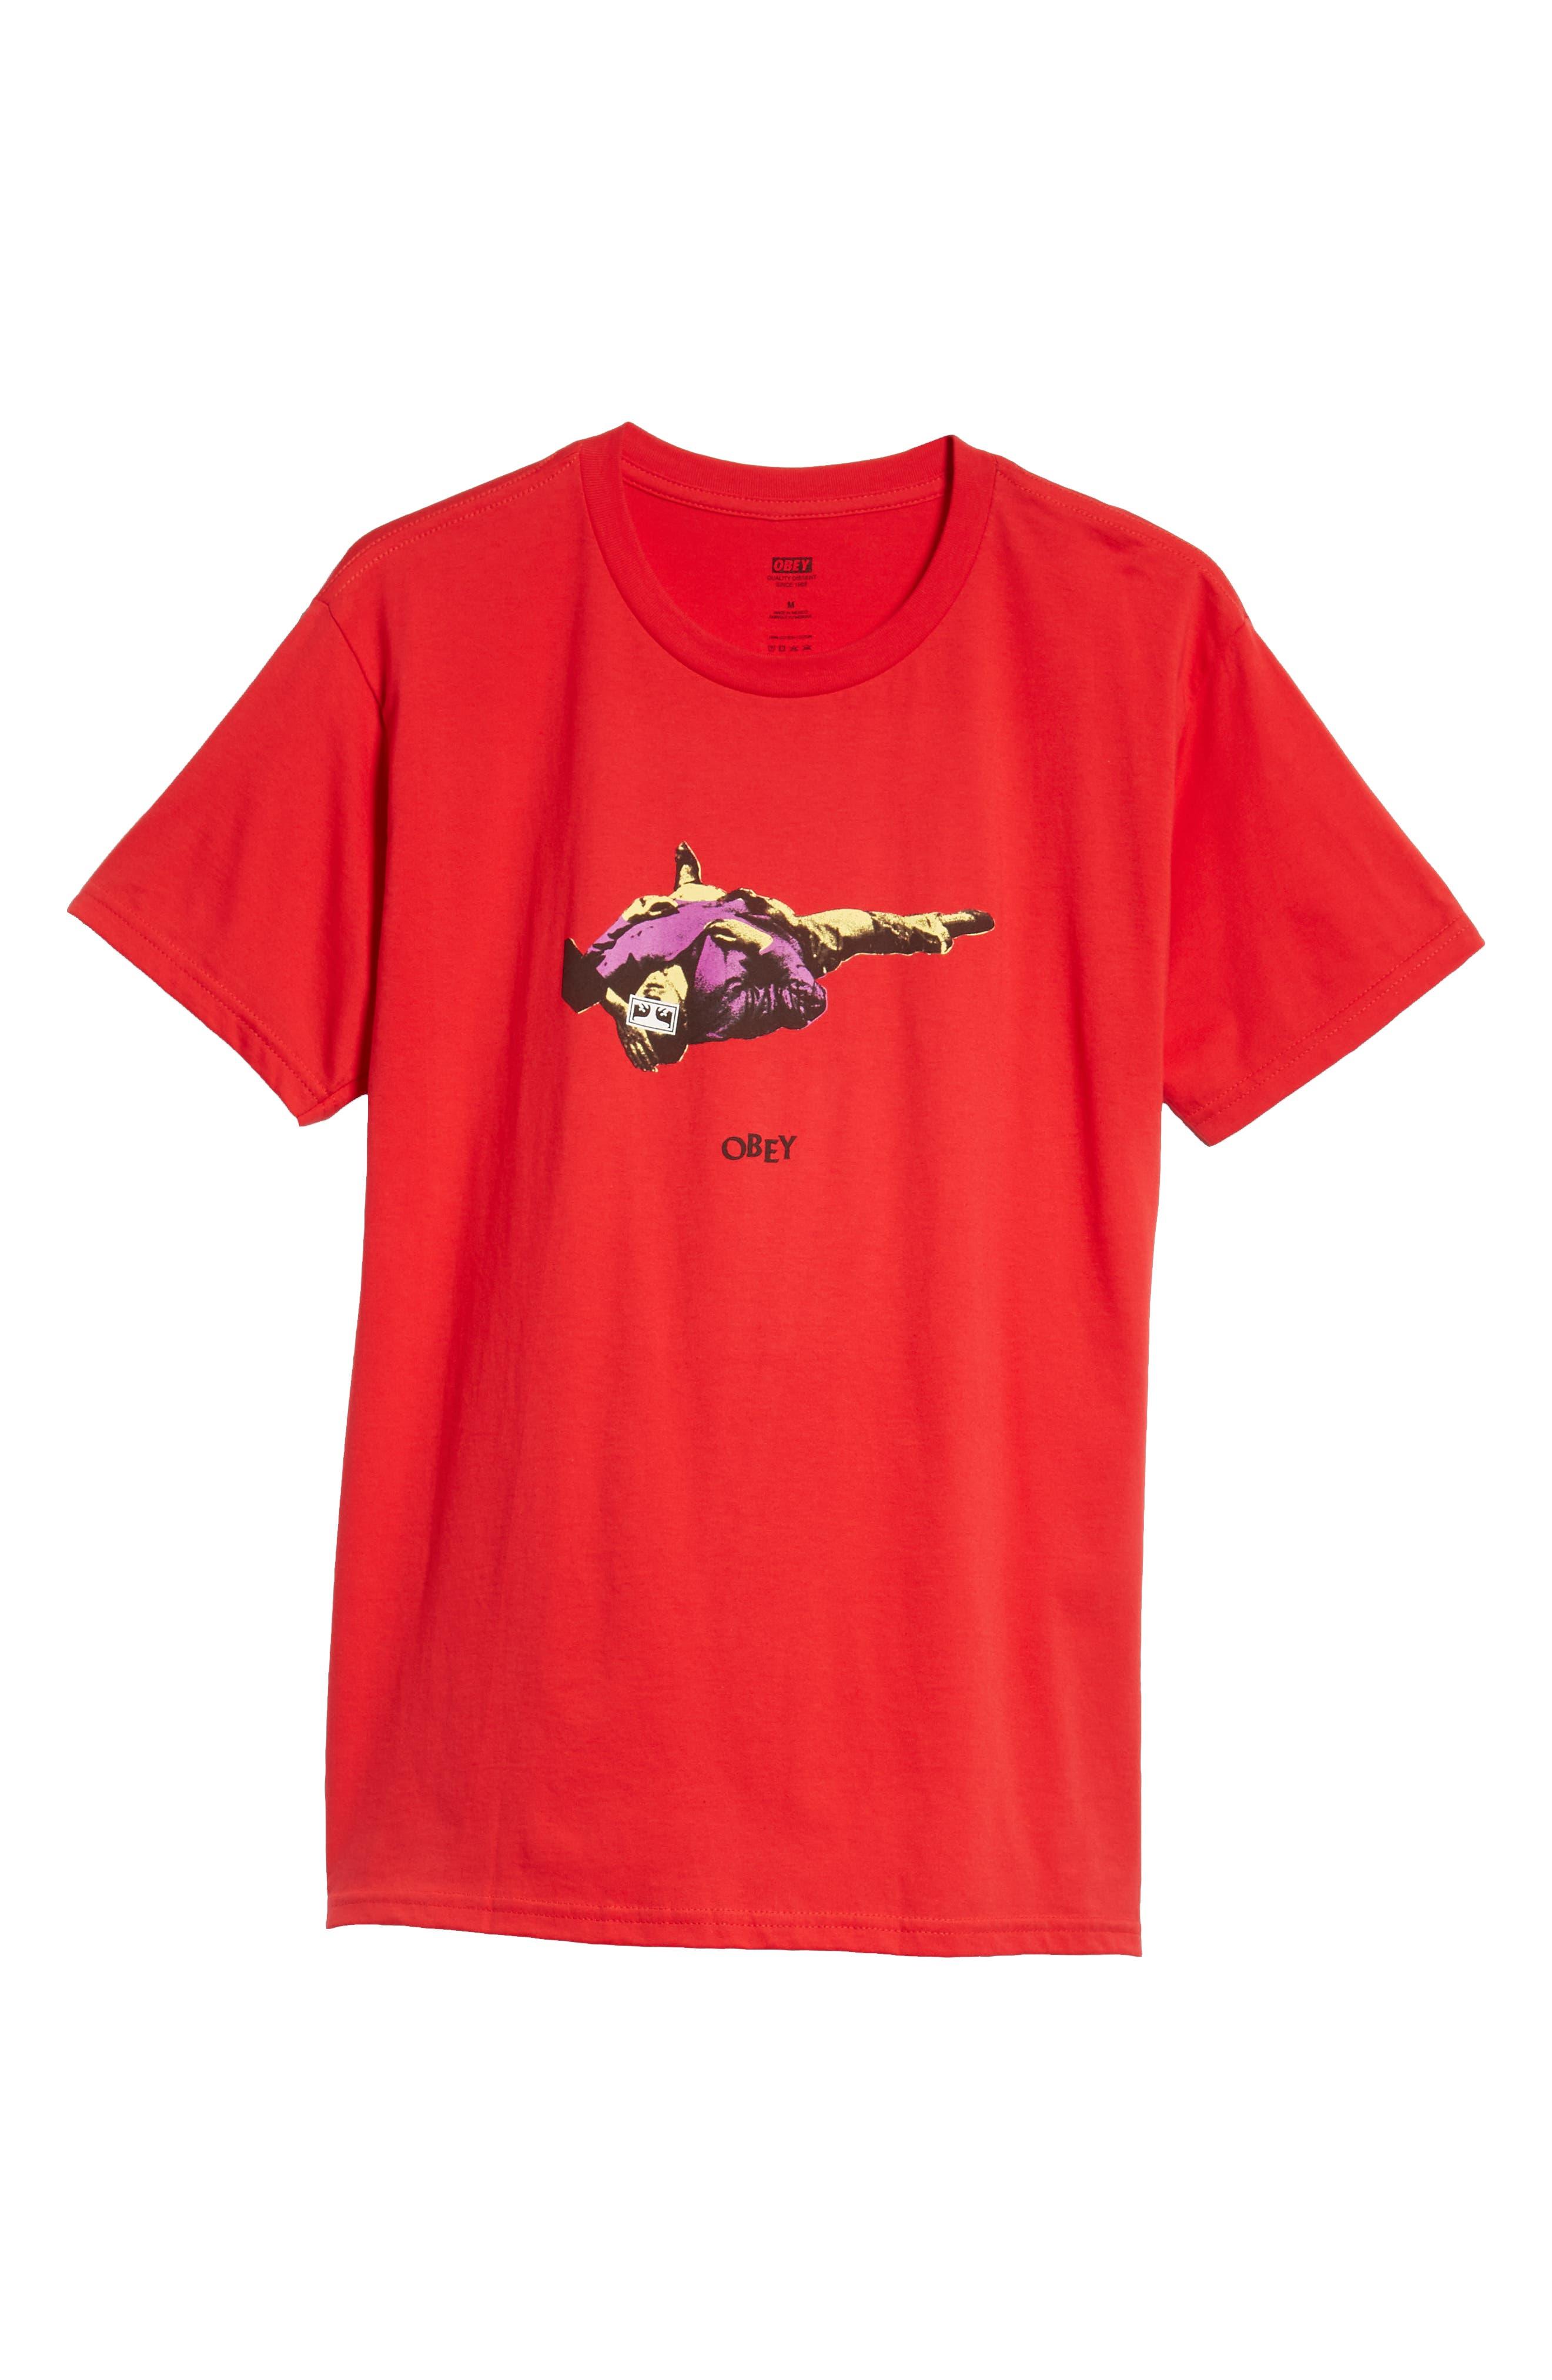 Cultural Rigor Mortis Premium T-Shirt,                             Alternate thumbnail 6, color,                             RED